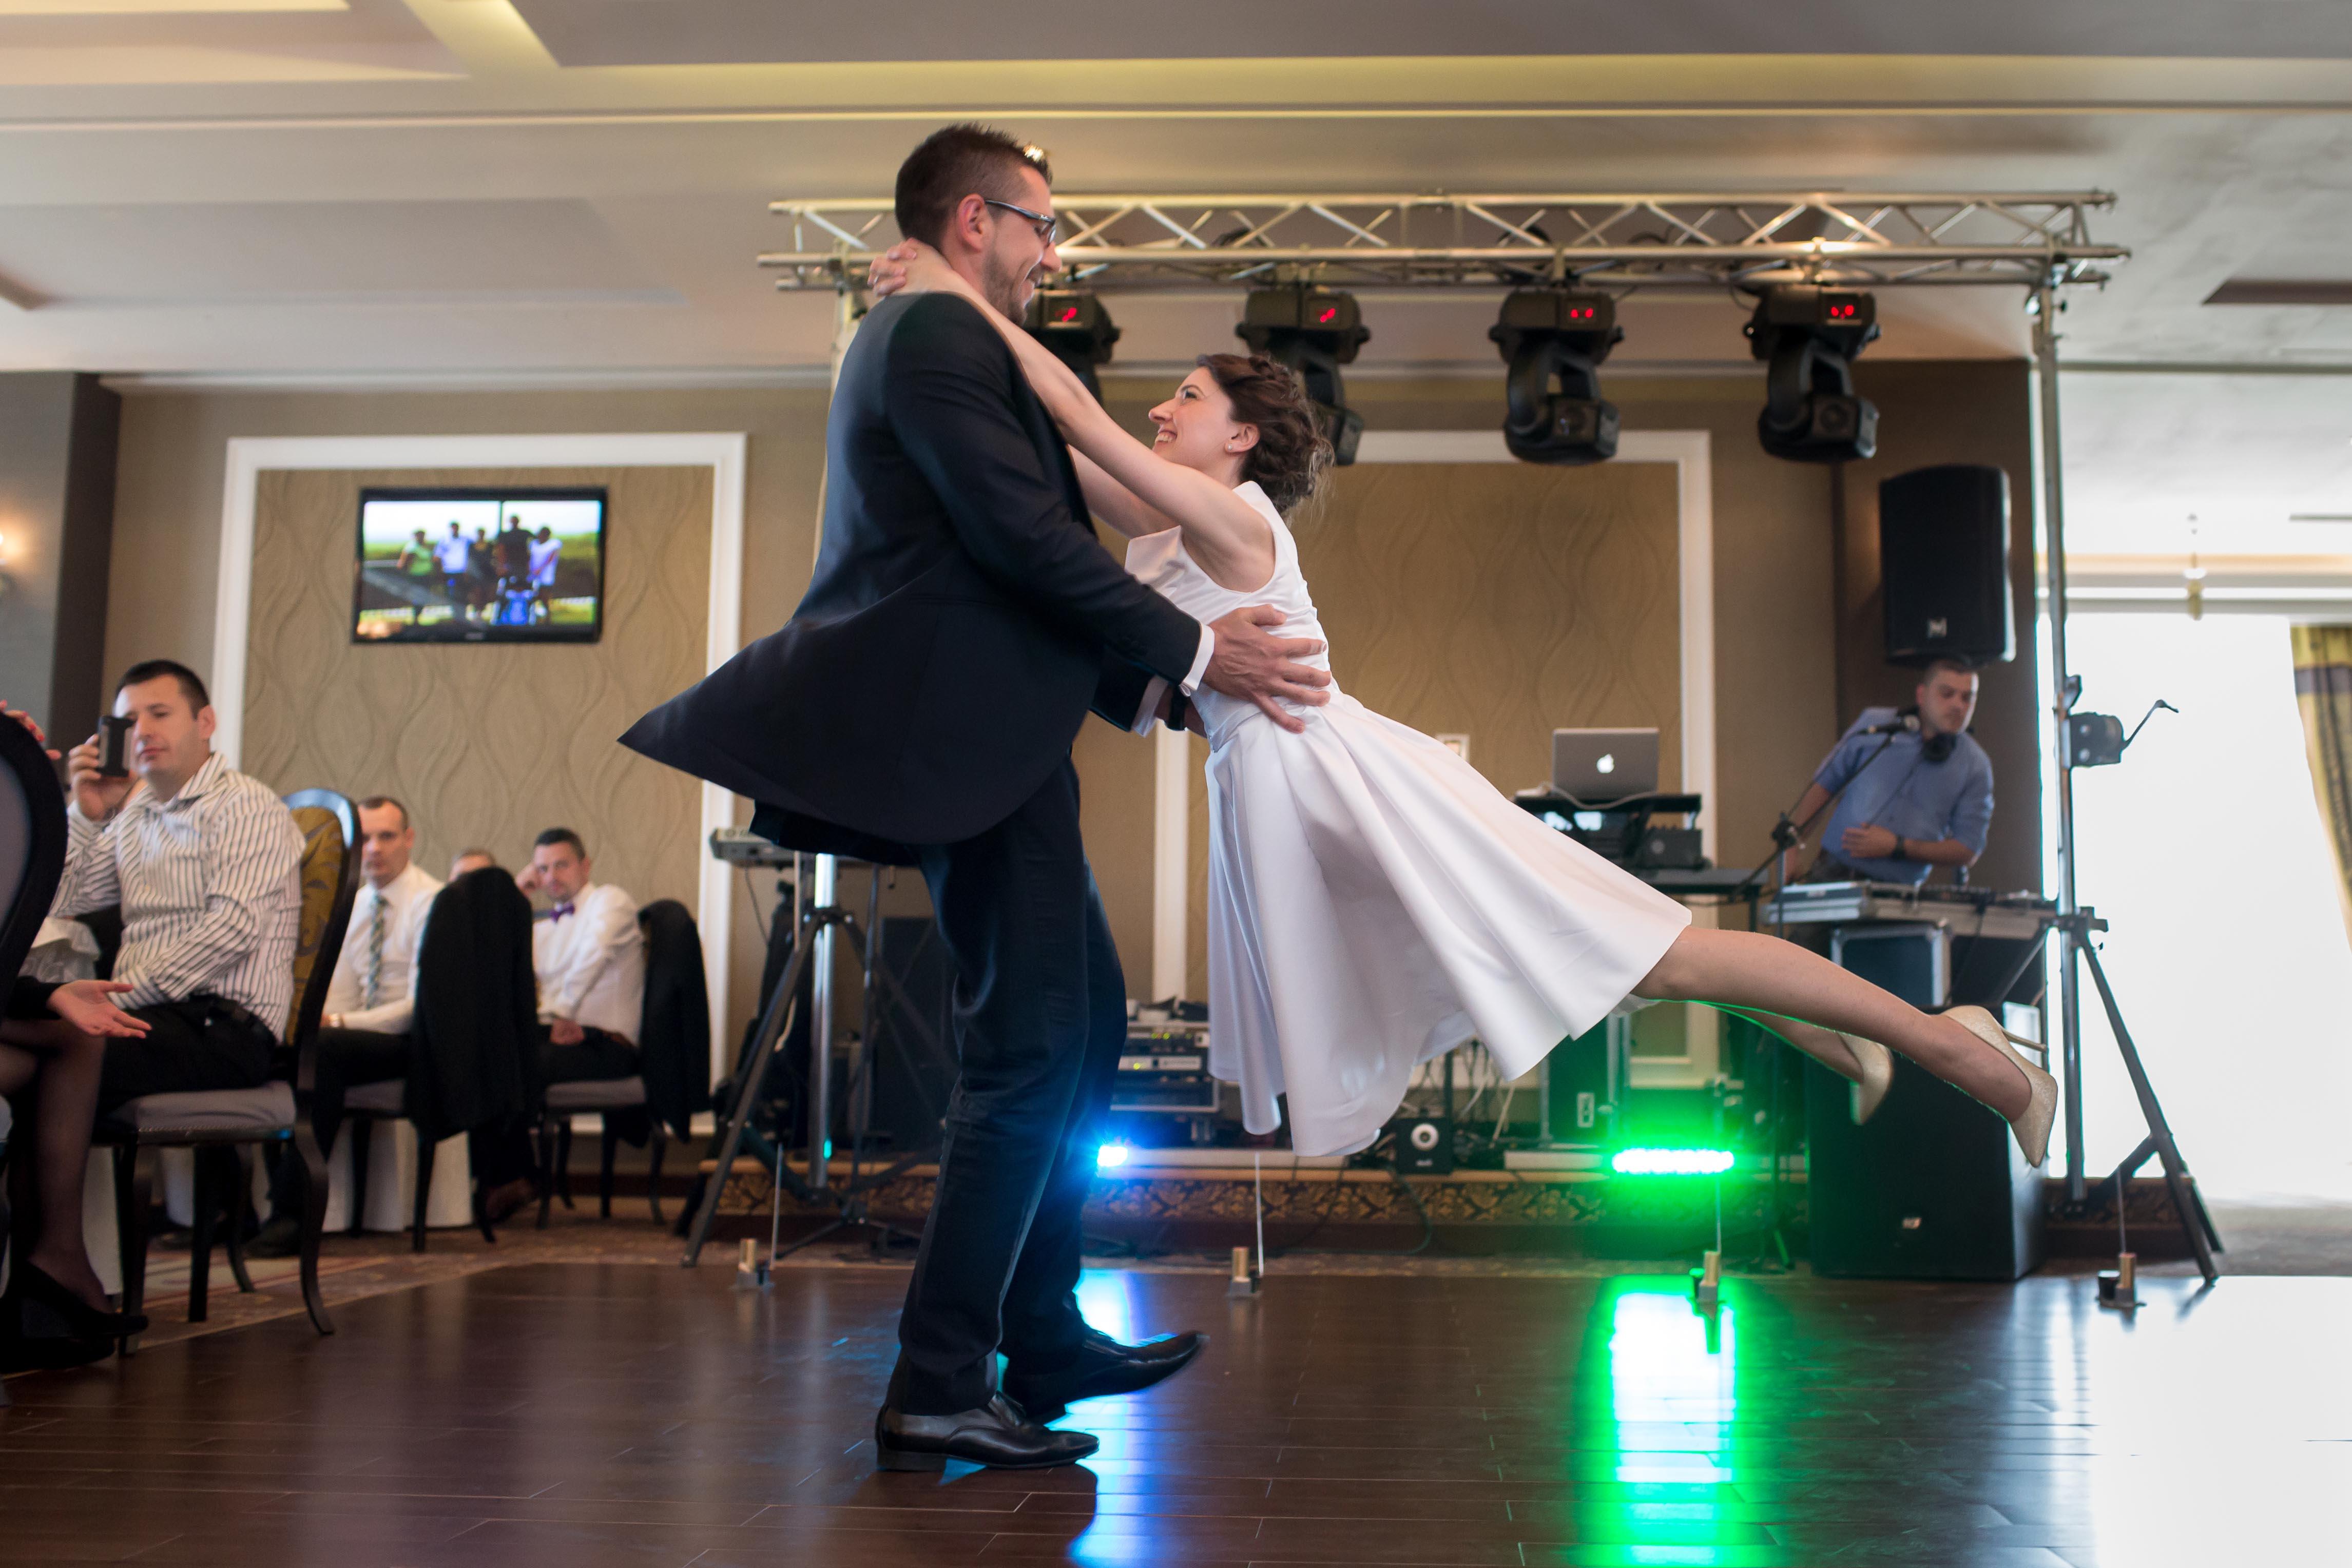 clases de baile en madrid clases particulares de baile